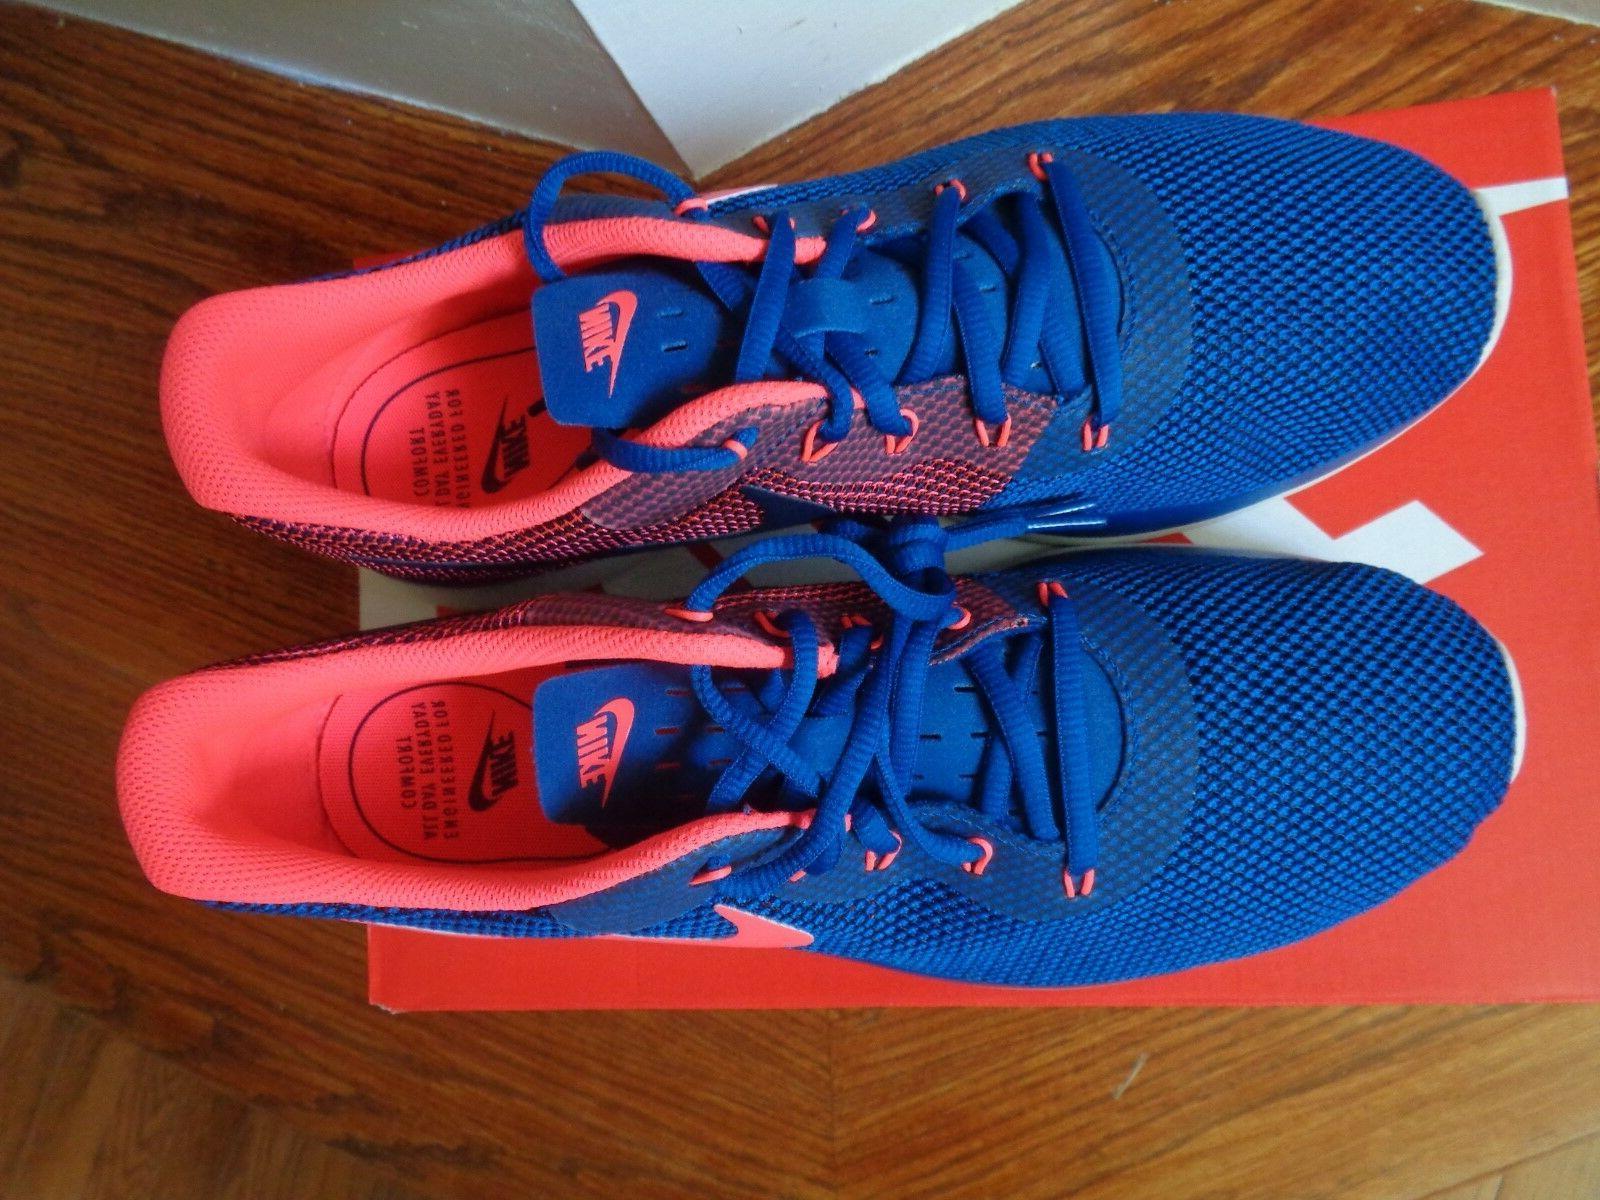 Nike Tanjun Racer Men's Running Shoes, 921669 Size NWB